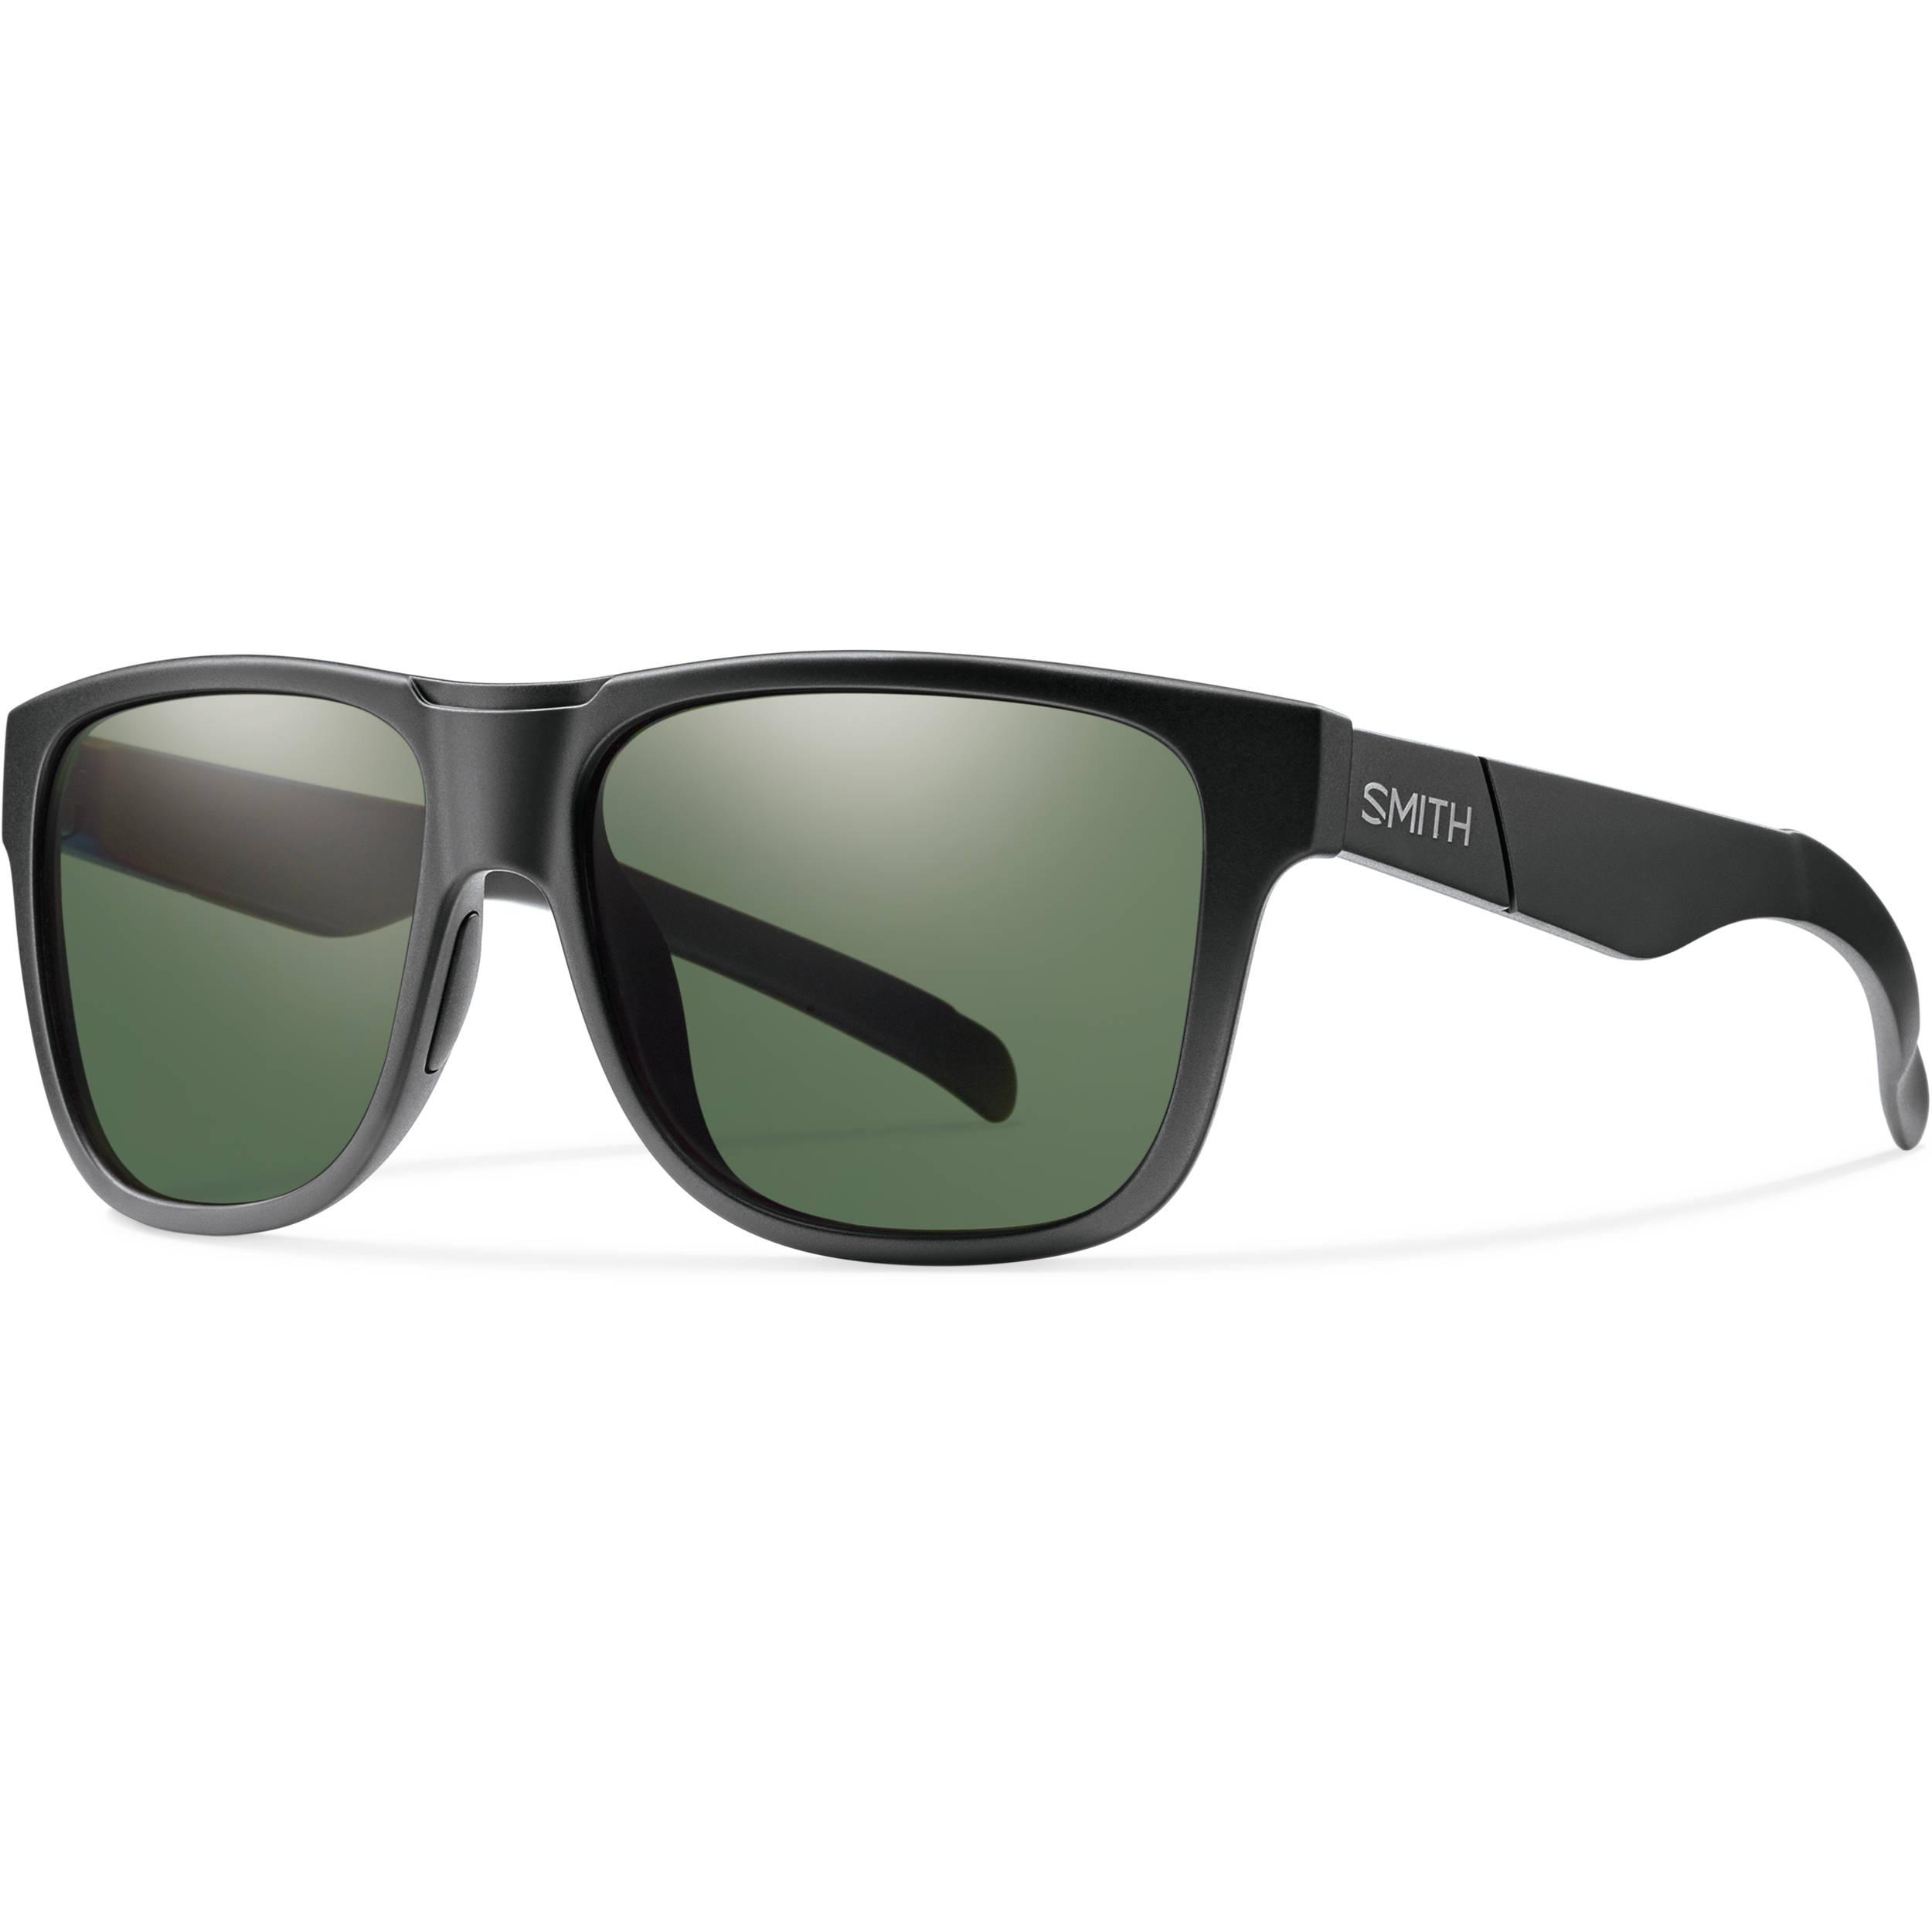 9018c6e97f Smith Optics Lowdown XL Men s Sunglasses with Polarized Gray-Green Lenses (Matte  Black Frame)